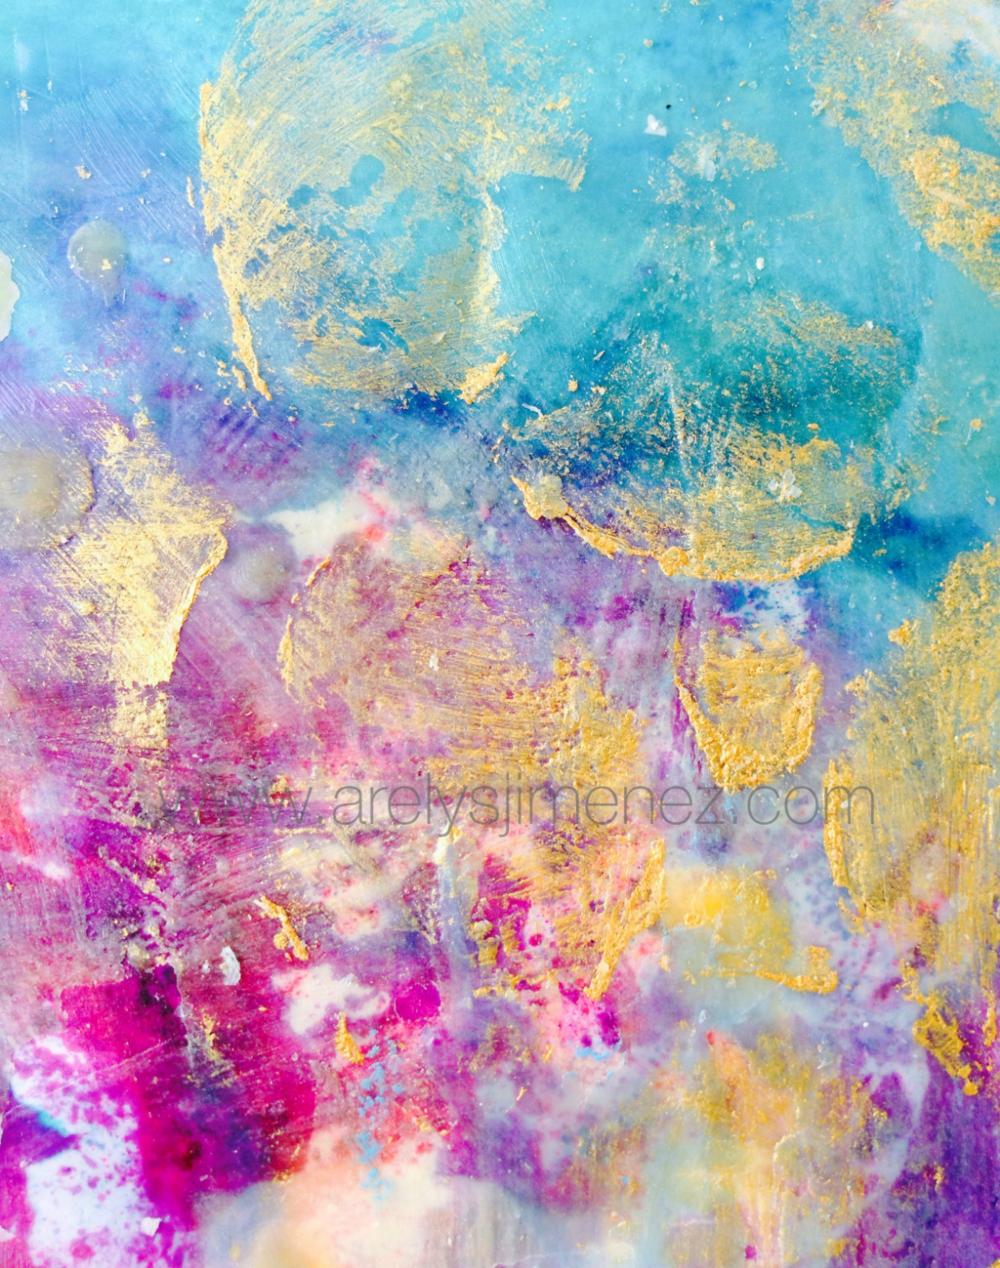 Encaustic painting.